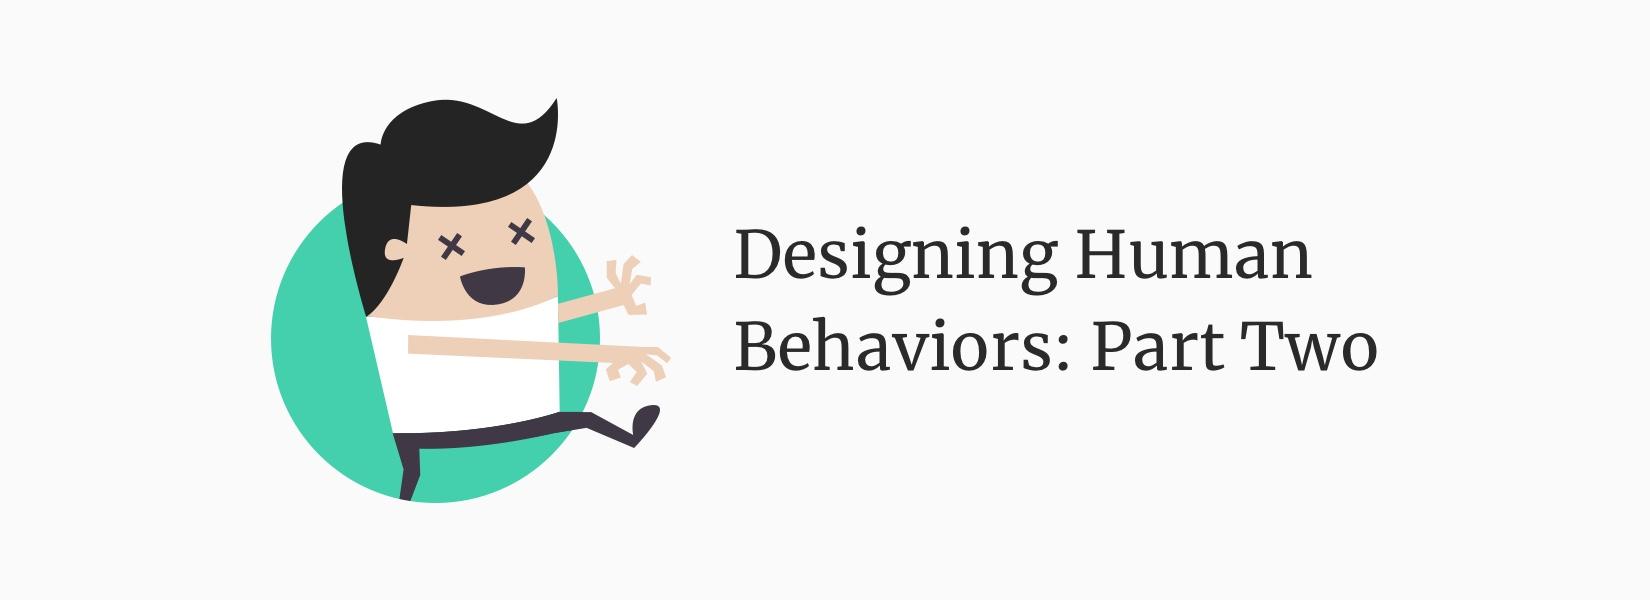 Designing Human Behaviors: Part Two